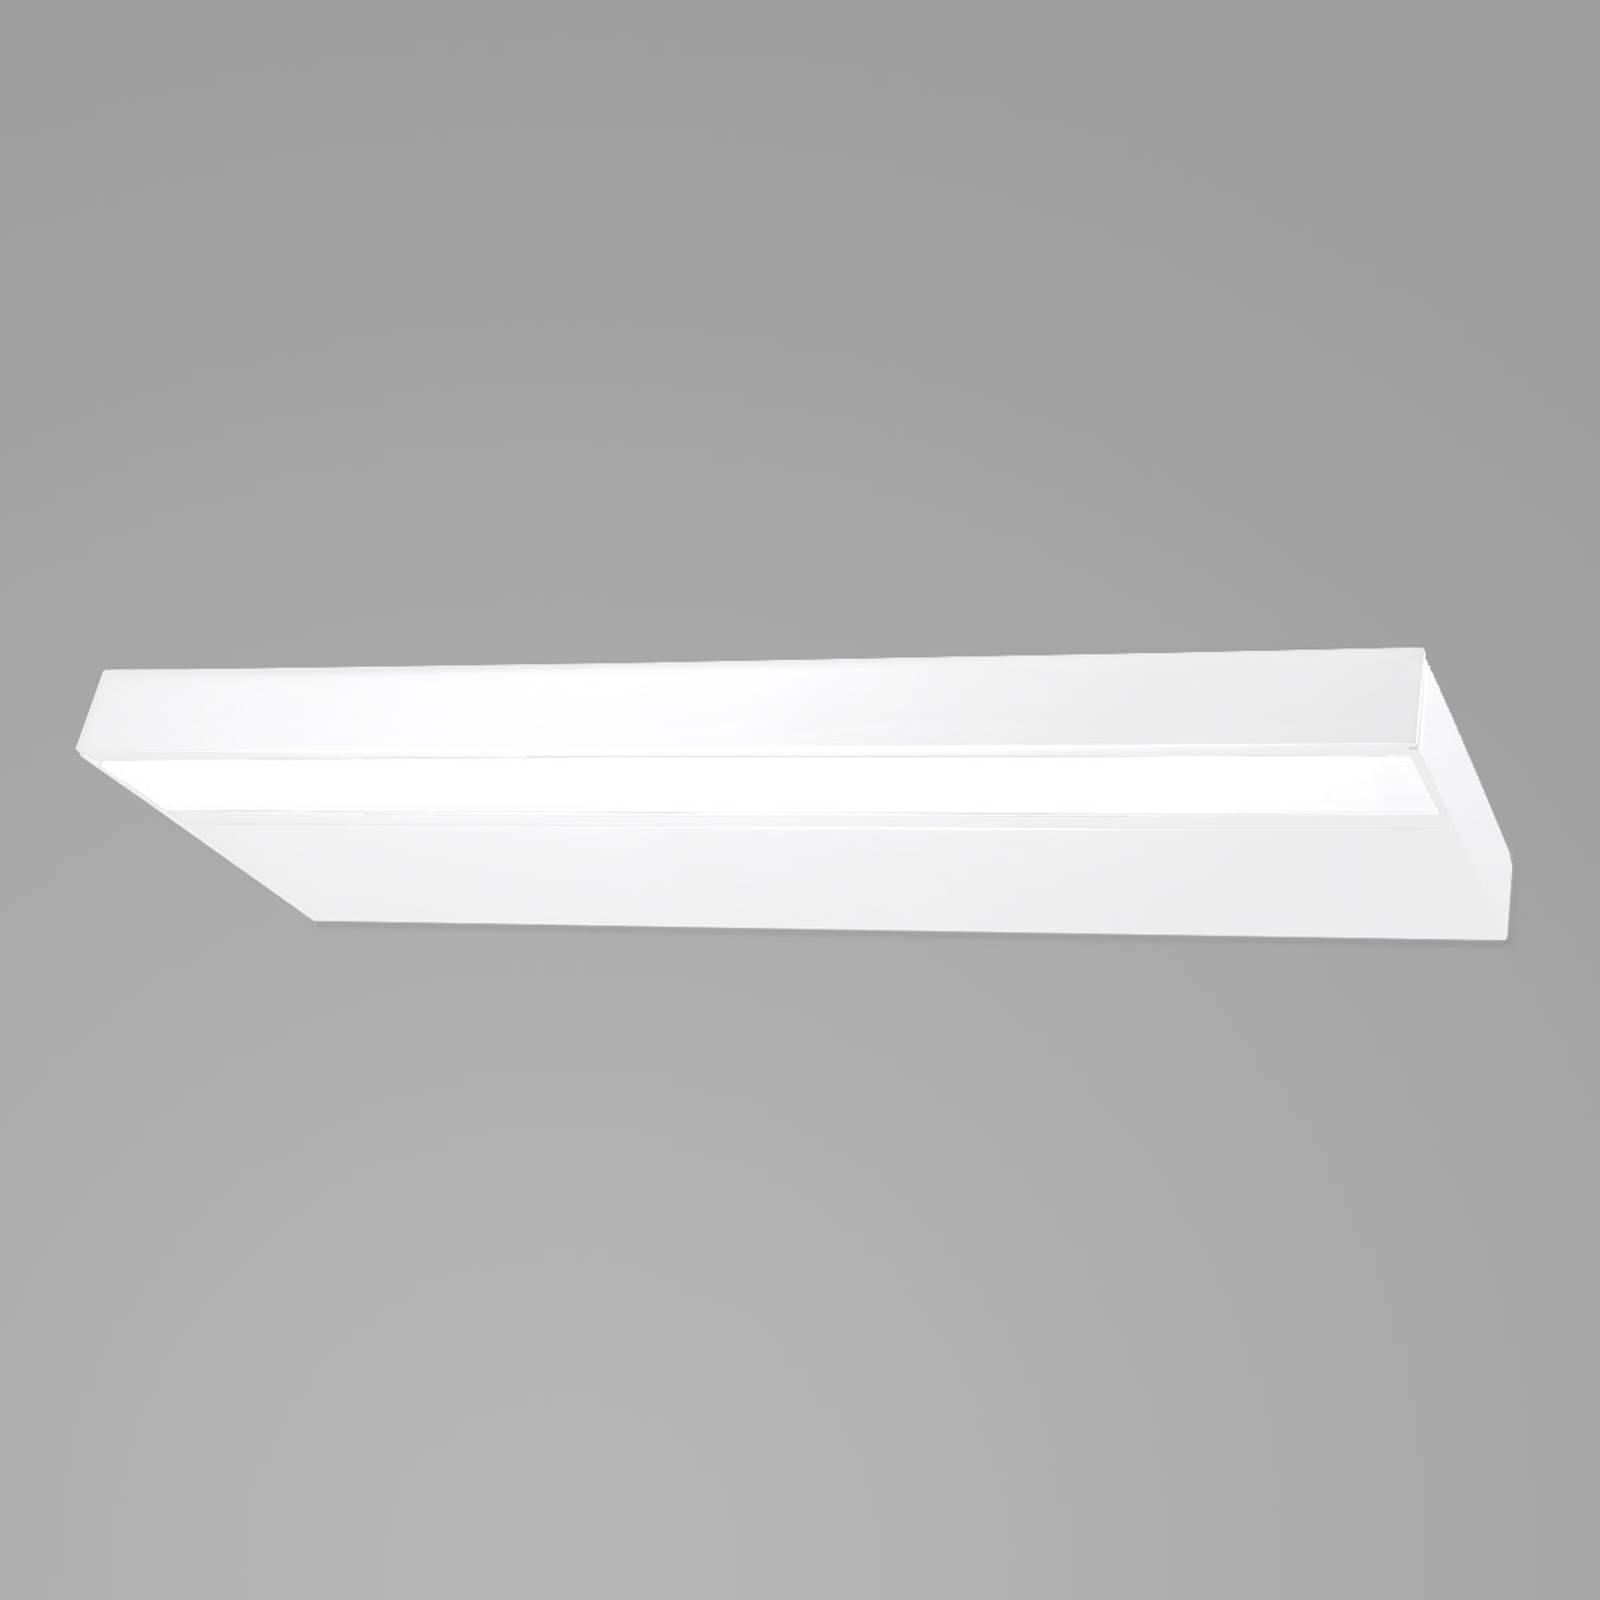 Applique salle de bain LED Prim IP20 60cm, blanc